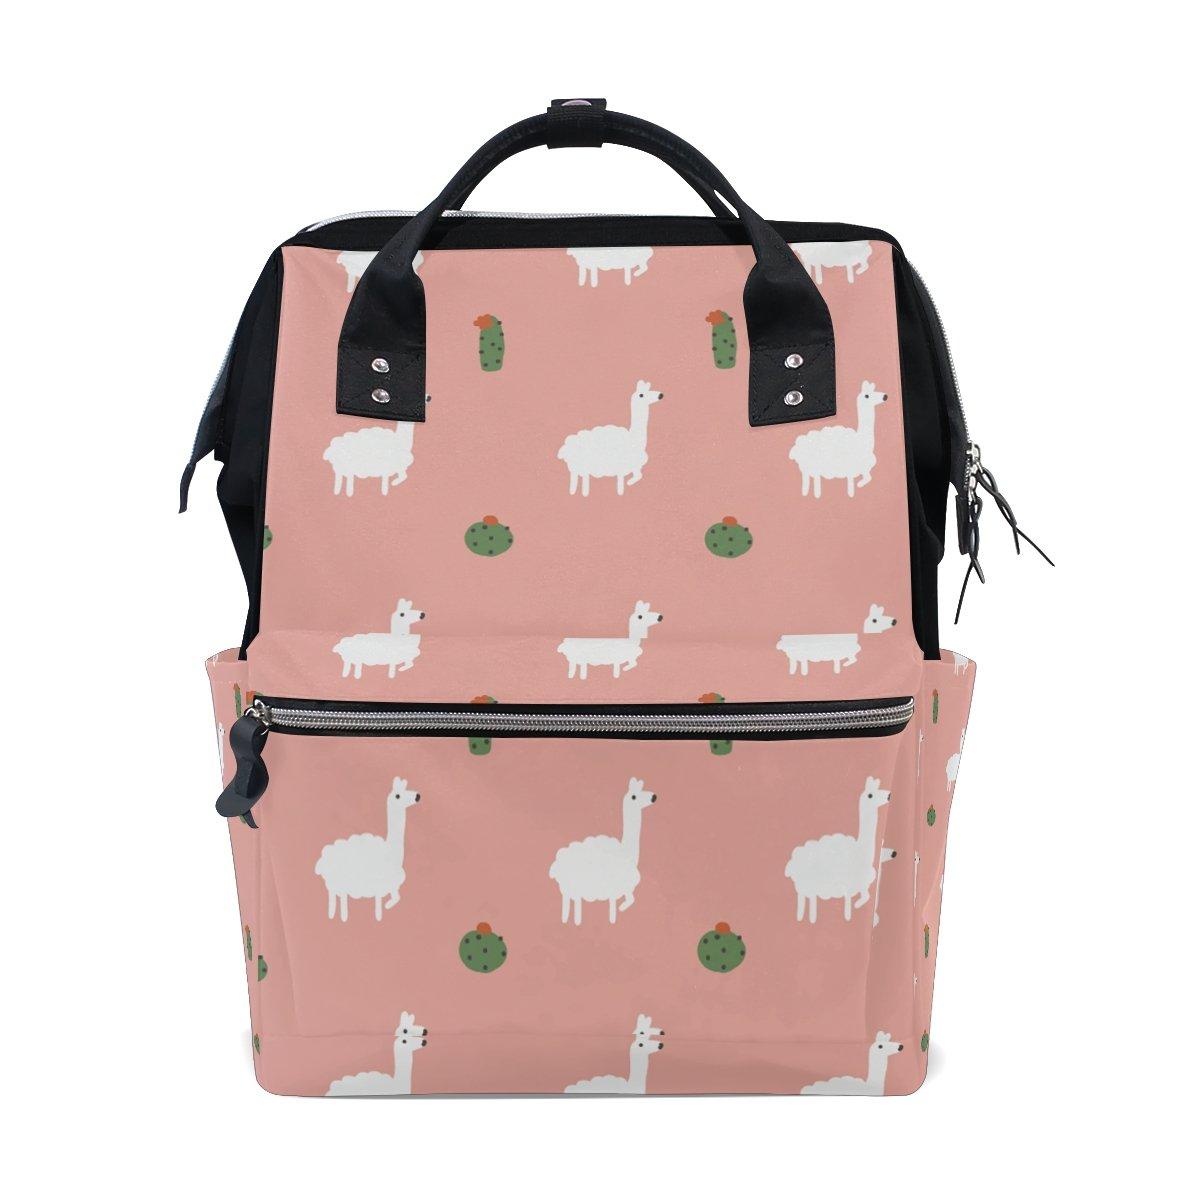 THUNANA Alpaca Pattern Pink Zipper Travel Large Capacity Baby Diaper Bag School Laptop Canvas Backpack Women